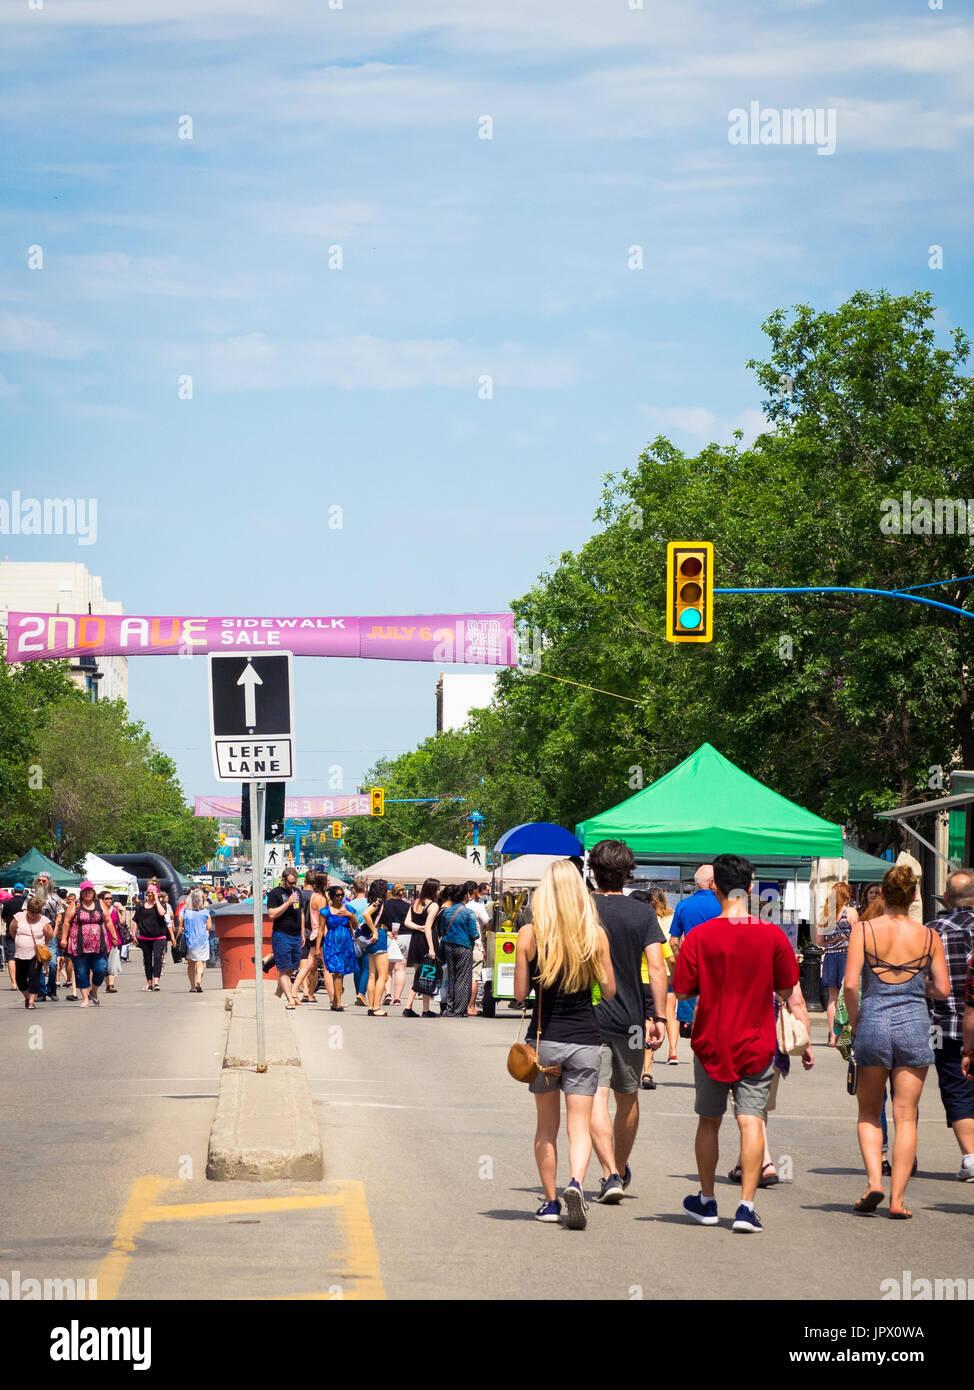 The 2nd Avenue Sidewalk Sale in Saskatoon, Saskatchewan, Canada.  A Saskatoon tradition, the sidewalk sale marked its 41st anniversary in 2017. - Stock Image